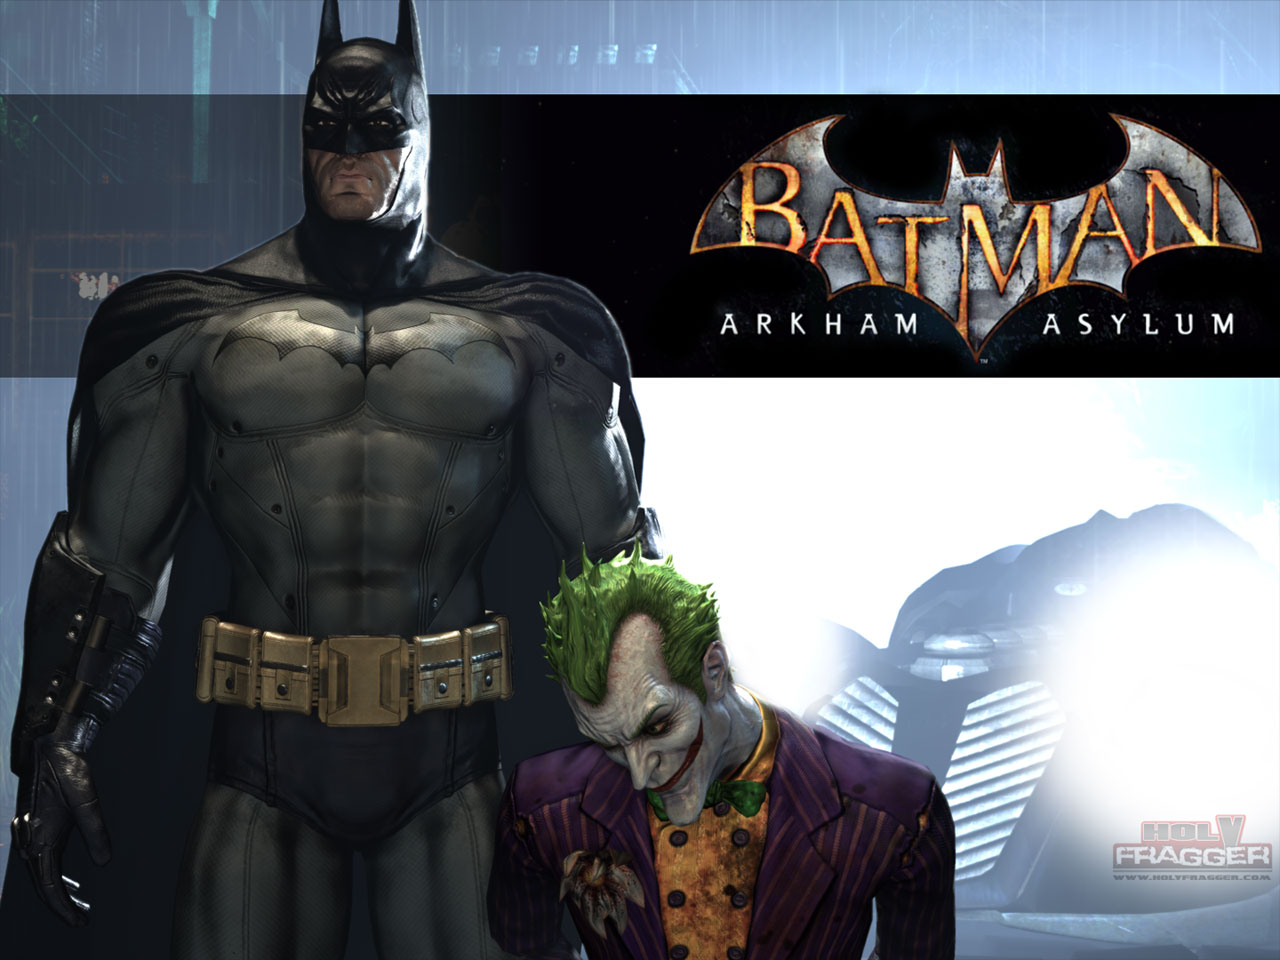 Batman Arkham Asylum Joker Wallpapers 4298 Hd Wallpapers in Games 1280x960